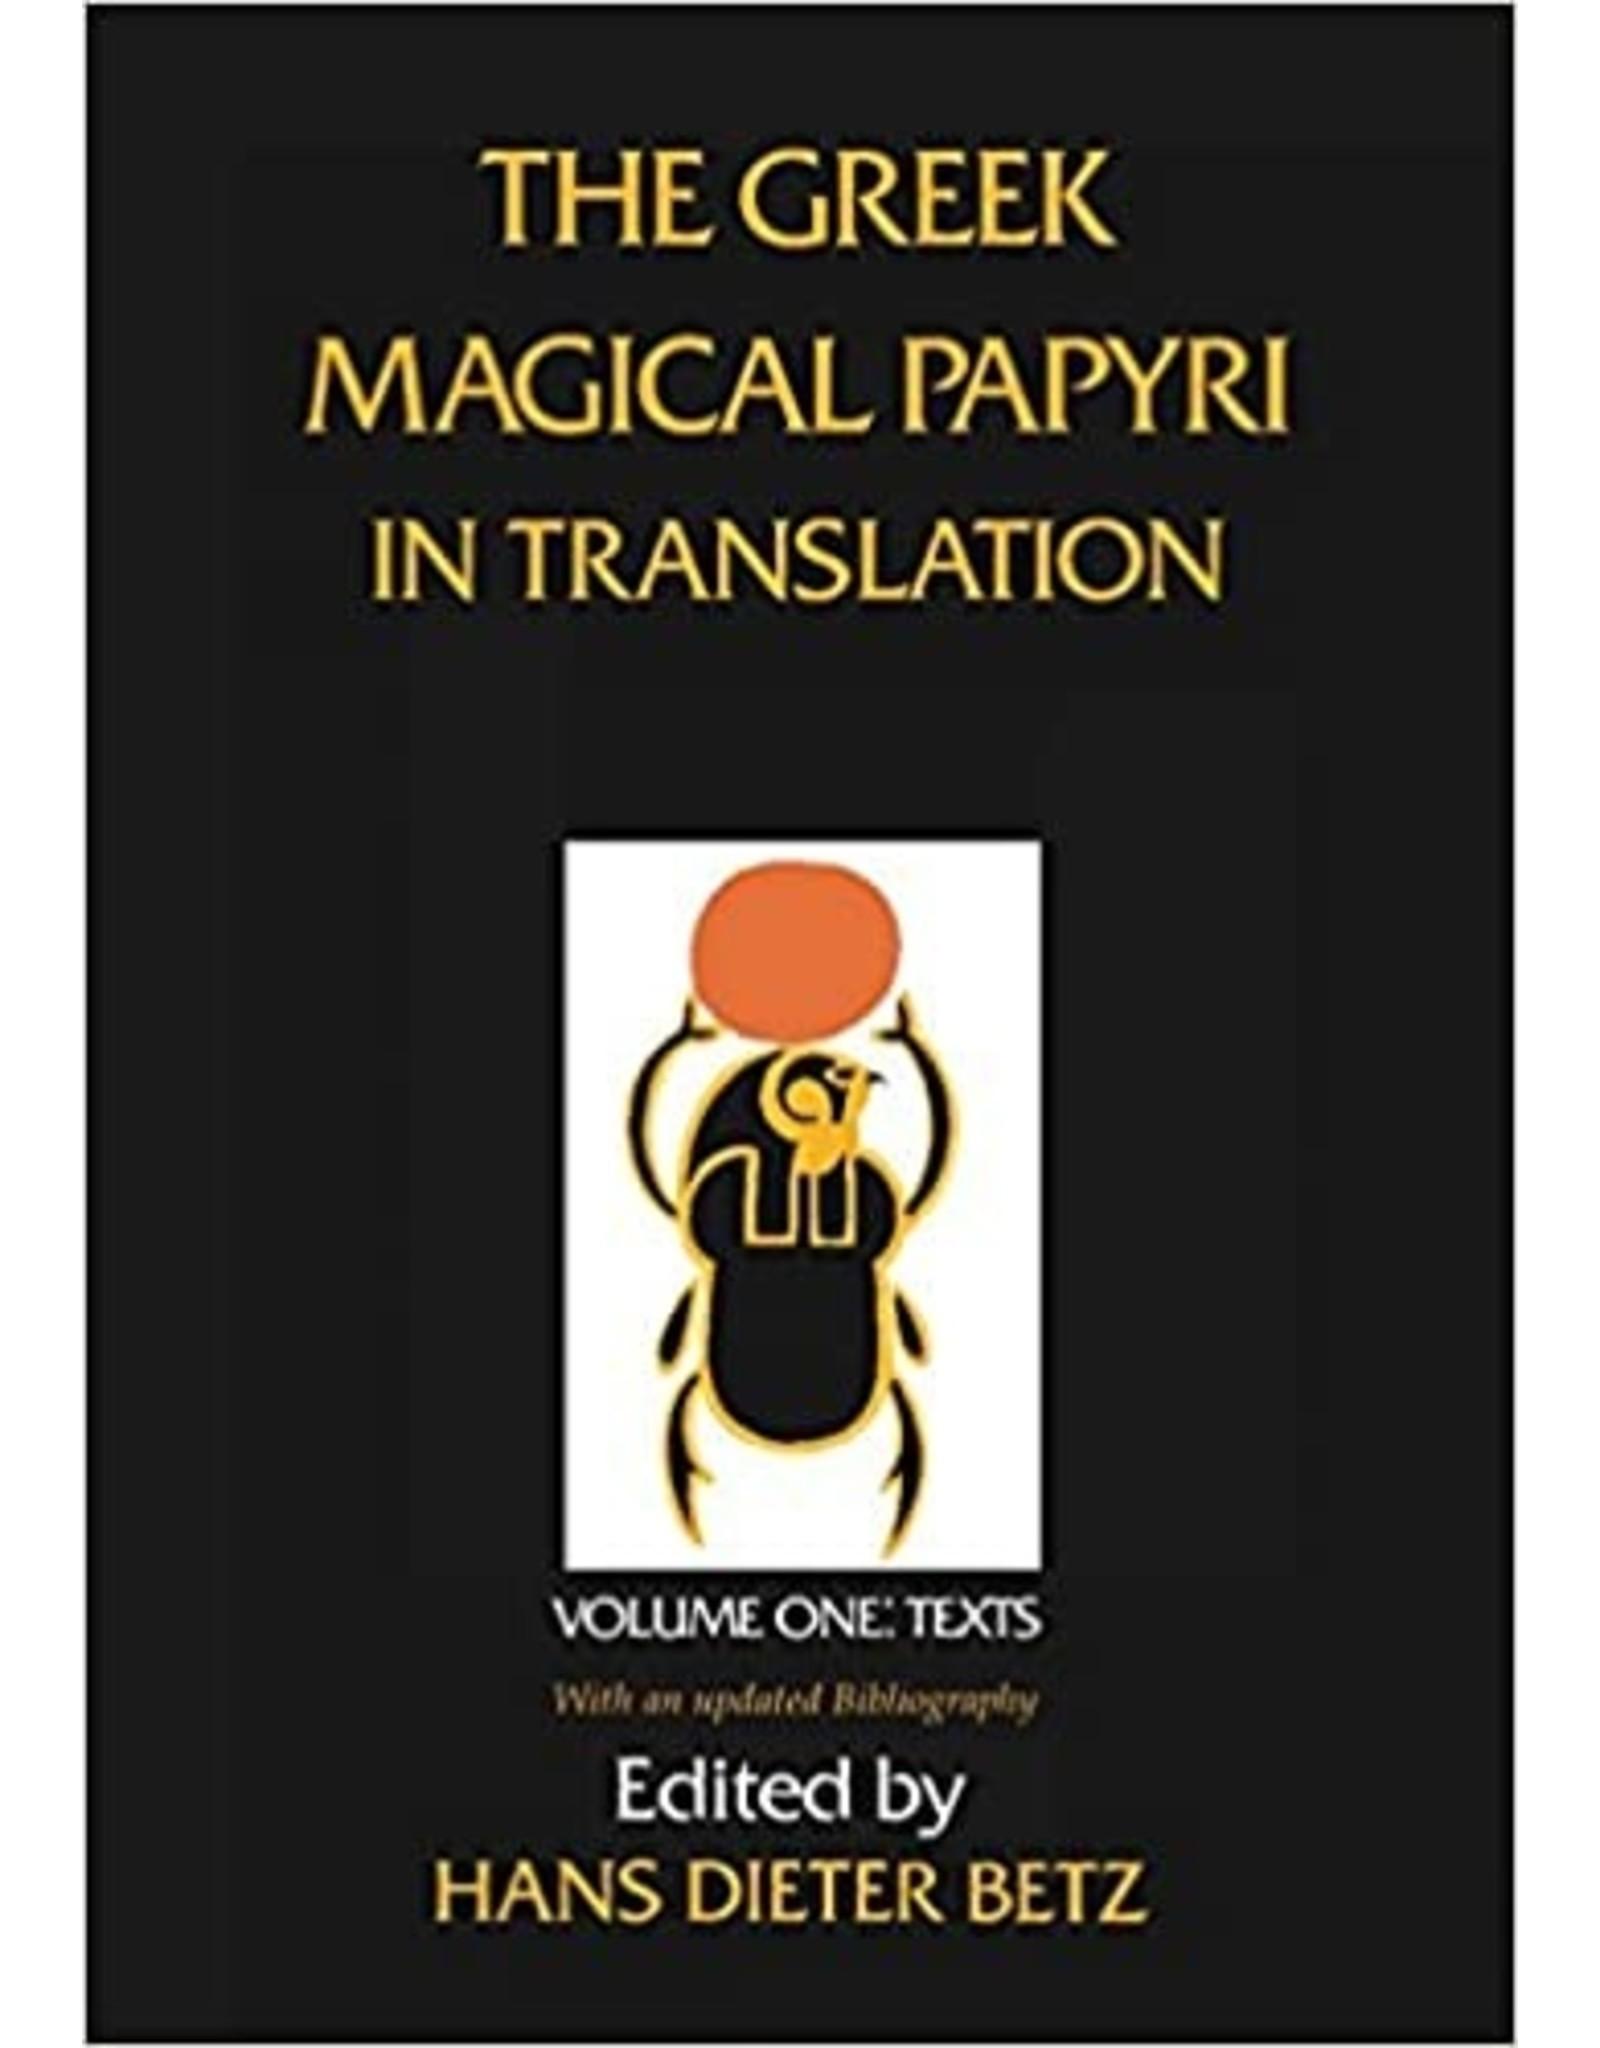 The Greek Magical Papyri in Translation